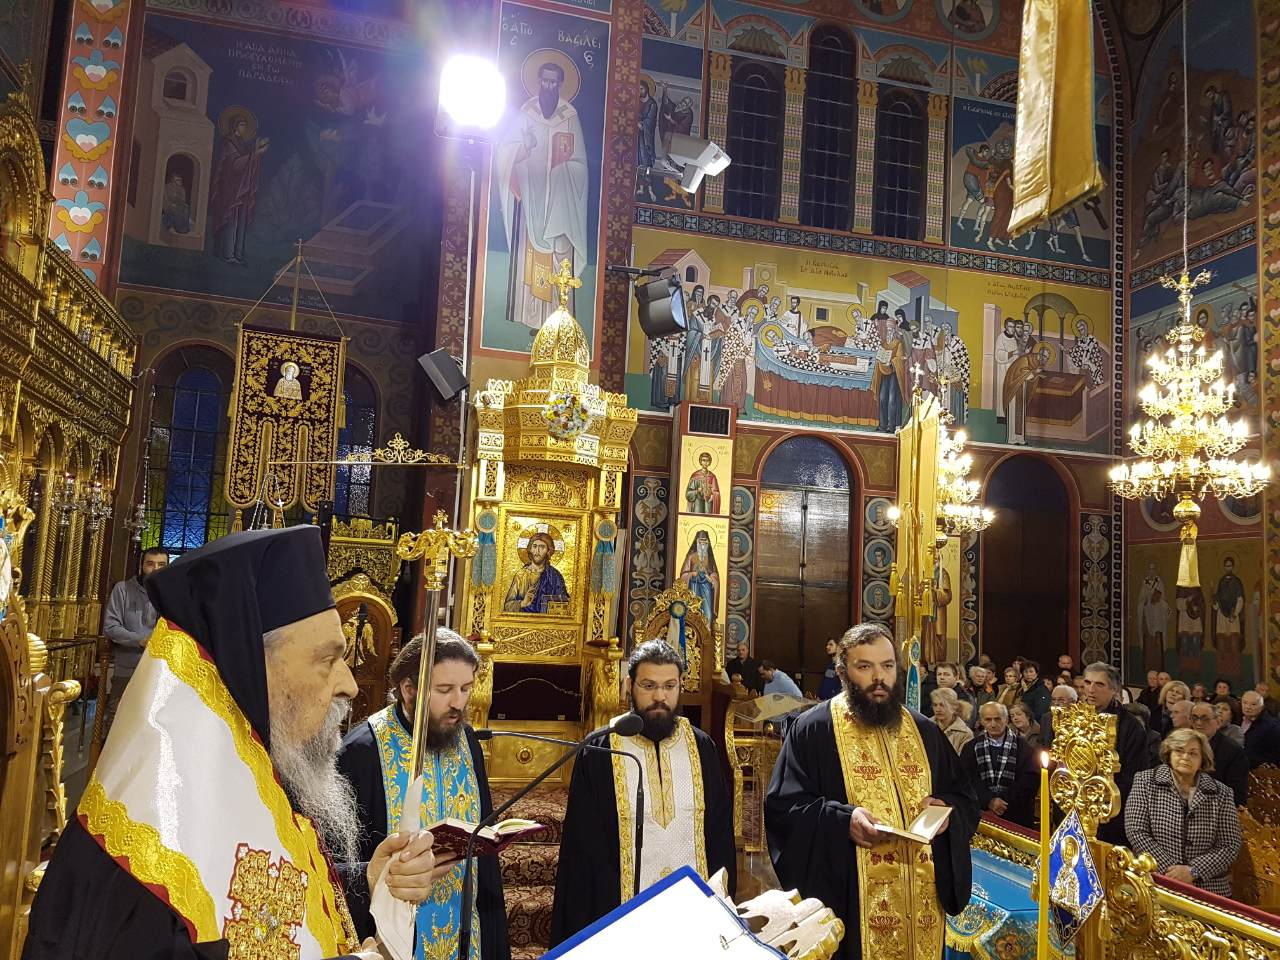 Euxelaio Xristougenna 2017 2 - Ευχέλαιο στον Ιερό Ναό του Αγίου Νικολάου στη Λάρισα